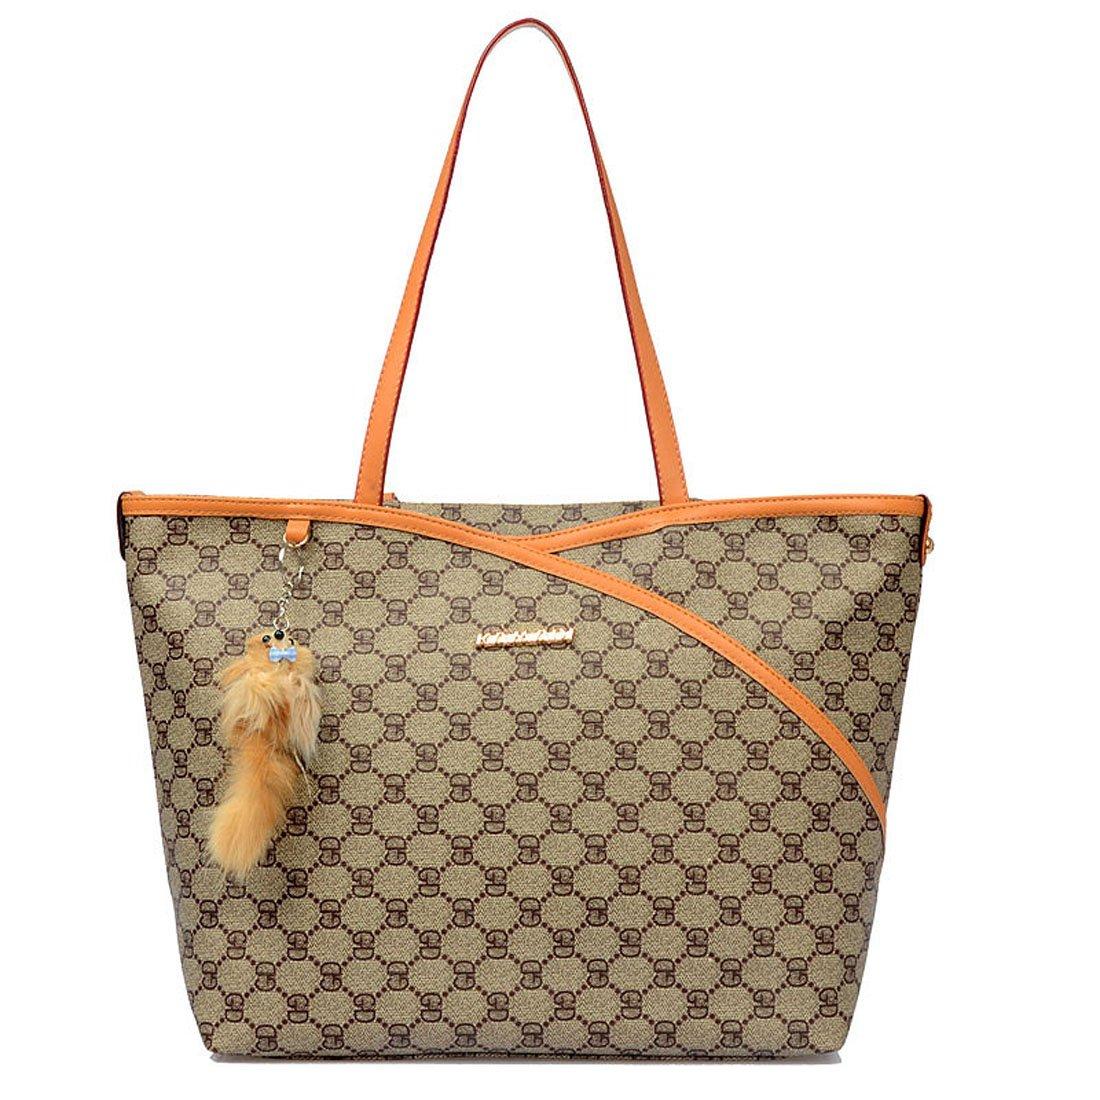 Kamadi 卡麦迪女包手提包2018新款单肩斜挎包欧美时尚简约女士包包